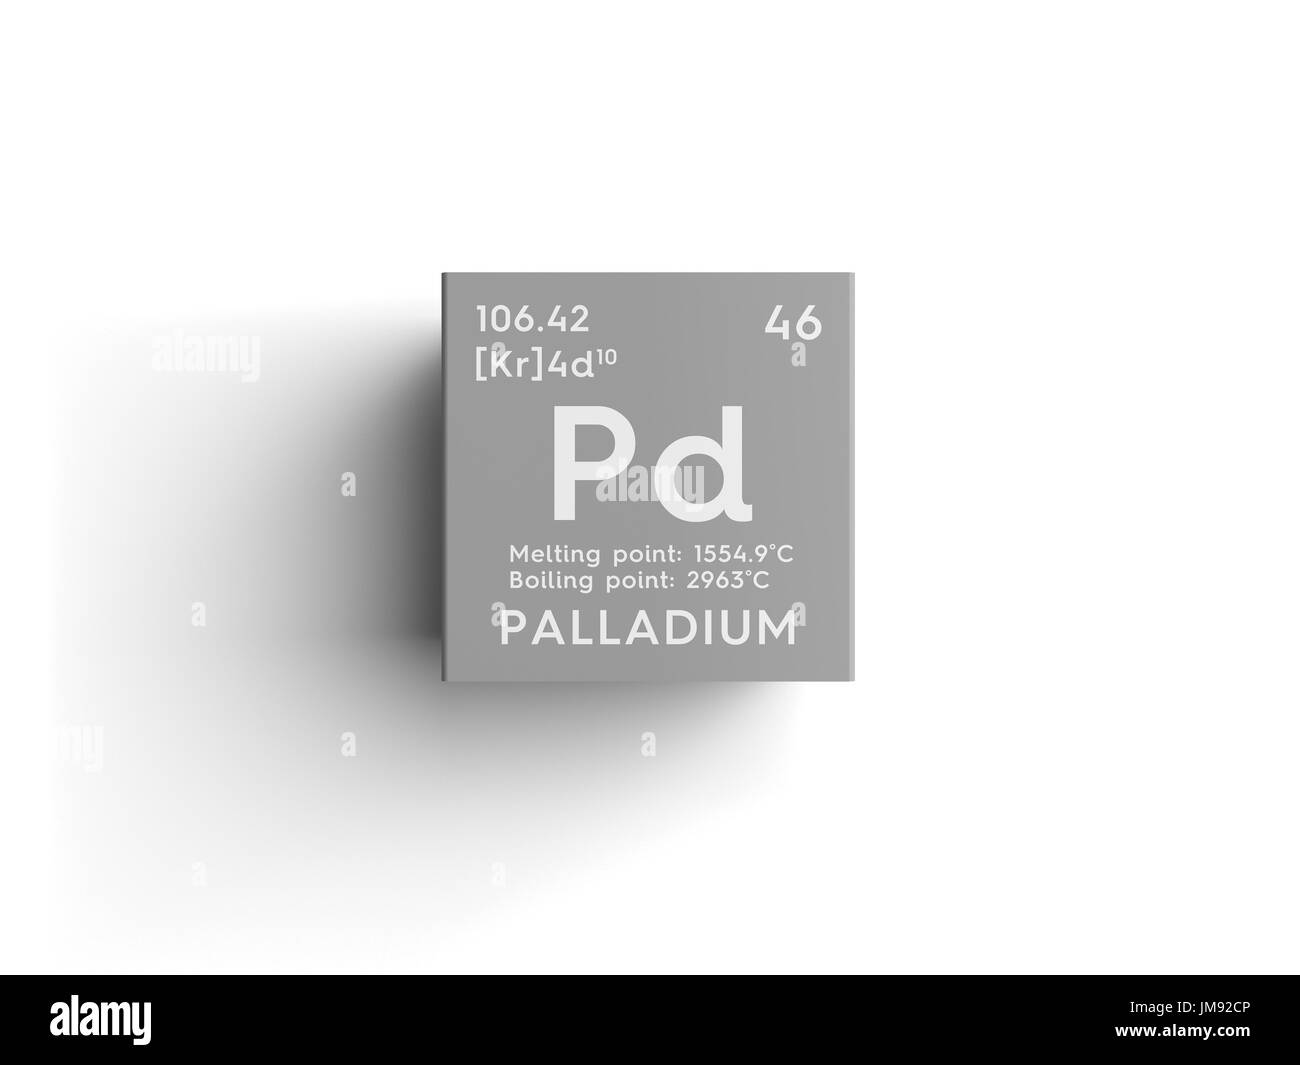 Palladium Element Stock Photos Palladium Element Stock Images Alamy